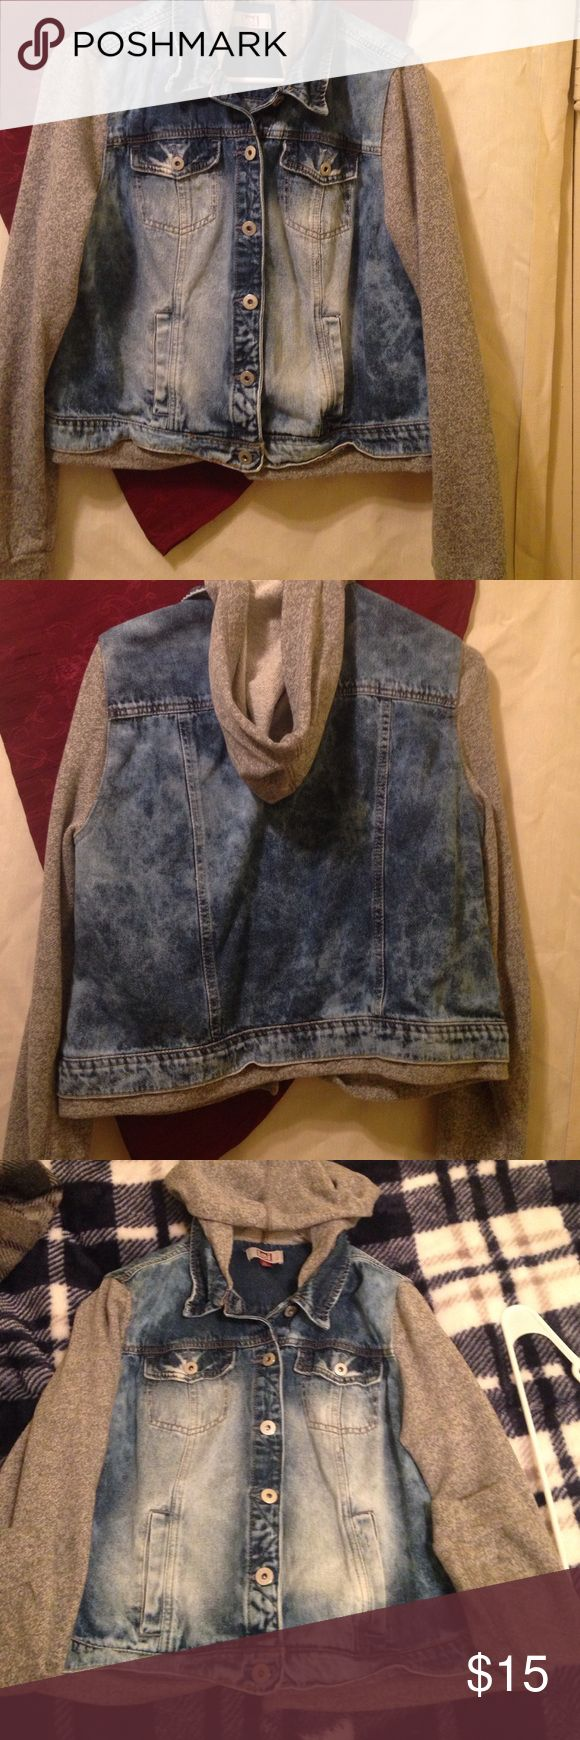 Lei Sweatshirt jean jacket combo. Brand new never wore. Size XL in juniors lei Tops Sweatshirts & Hoodies